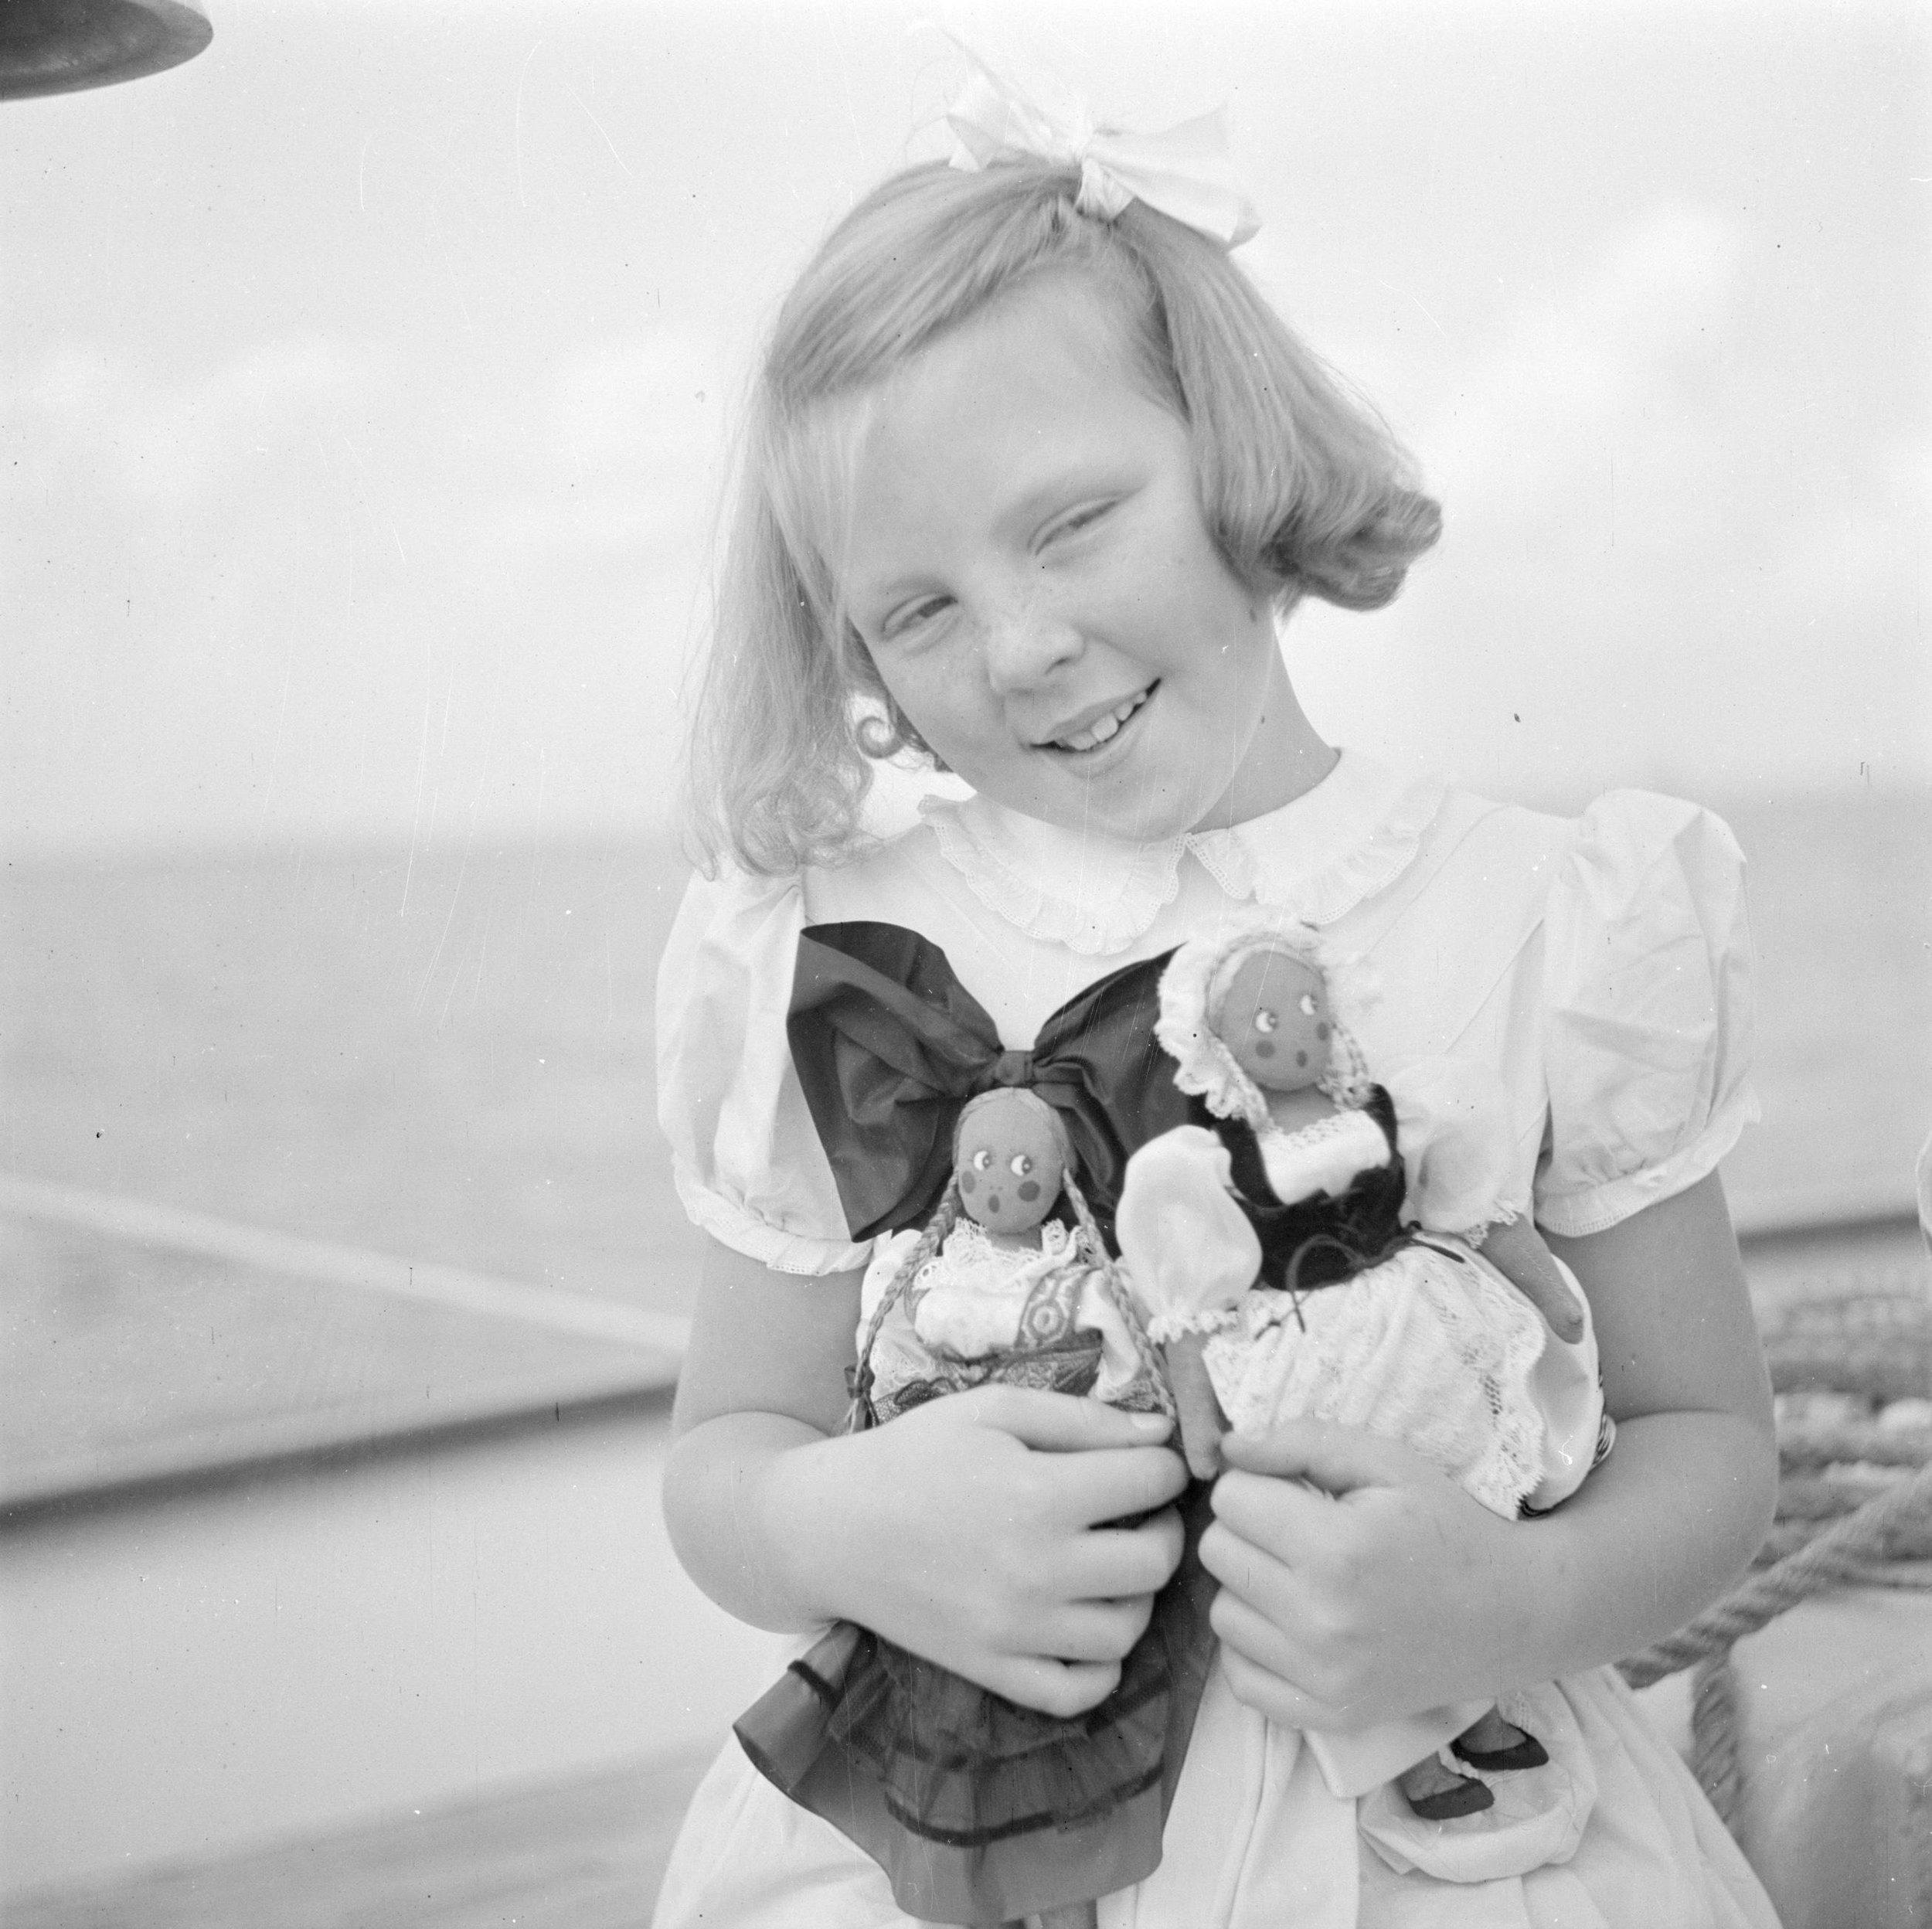 Prinzessin Beatrix 1946 mit Puppen französischer Kleidung    Foto: Willem van de Poll, Nationaal Archief, Fotocollective van de Poll, Public Domain